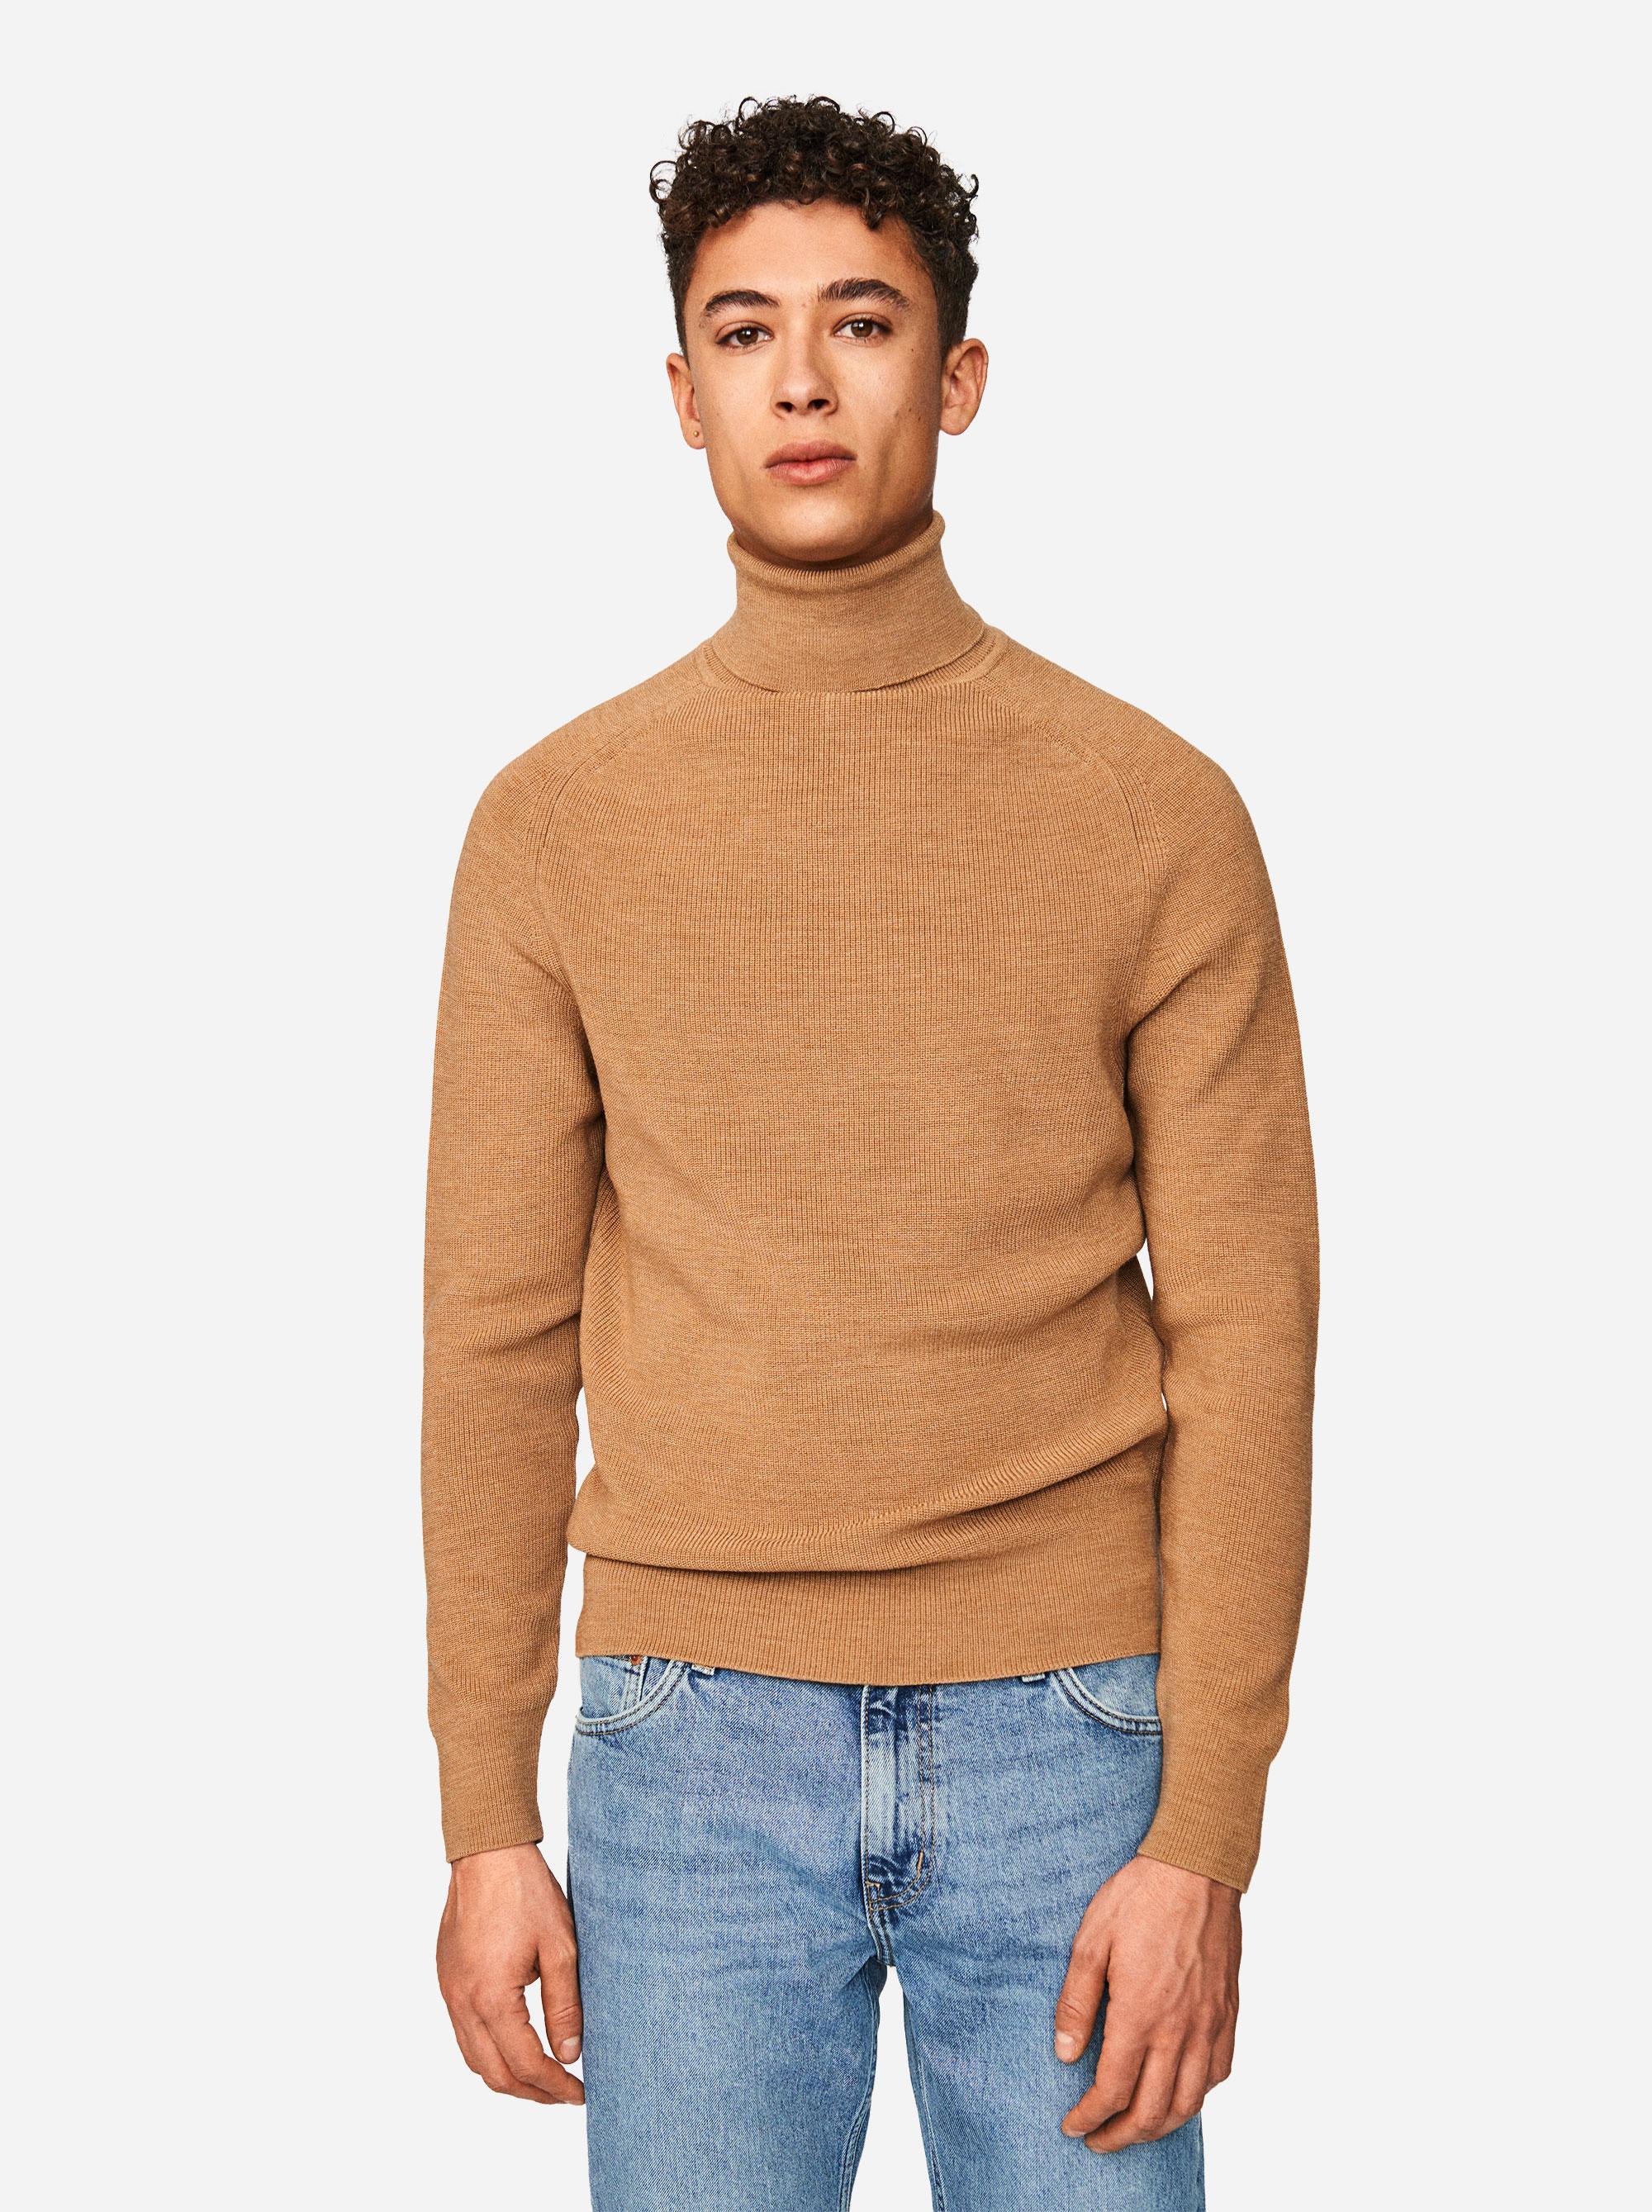 Teym - Turtleneck - The Merino Sweater - Men - Camel - 1